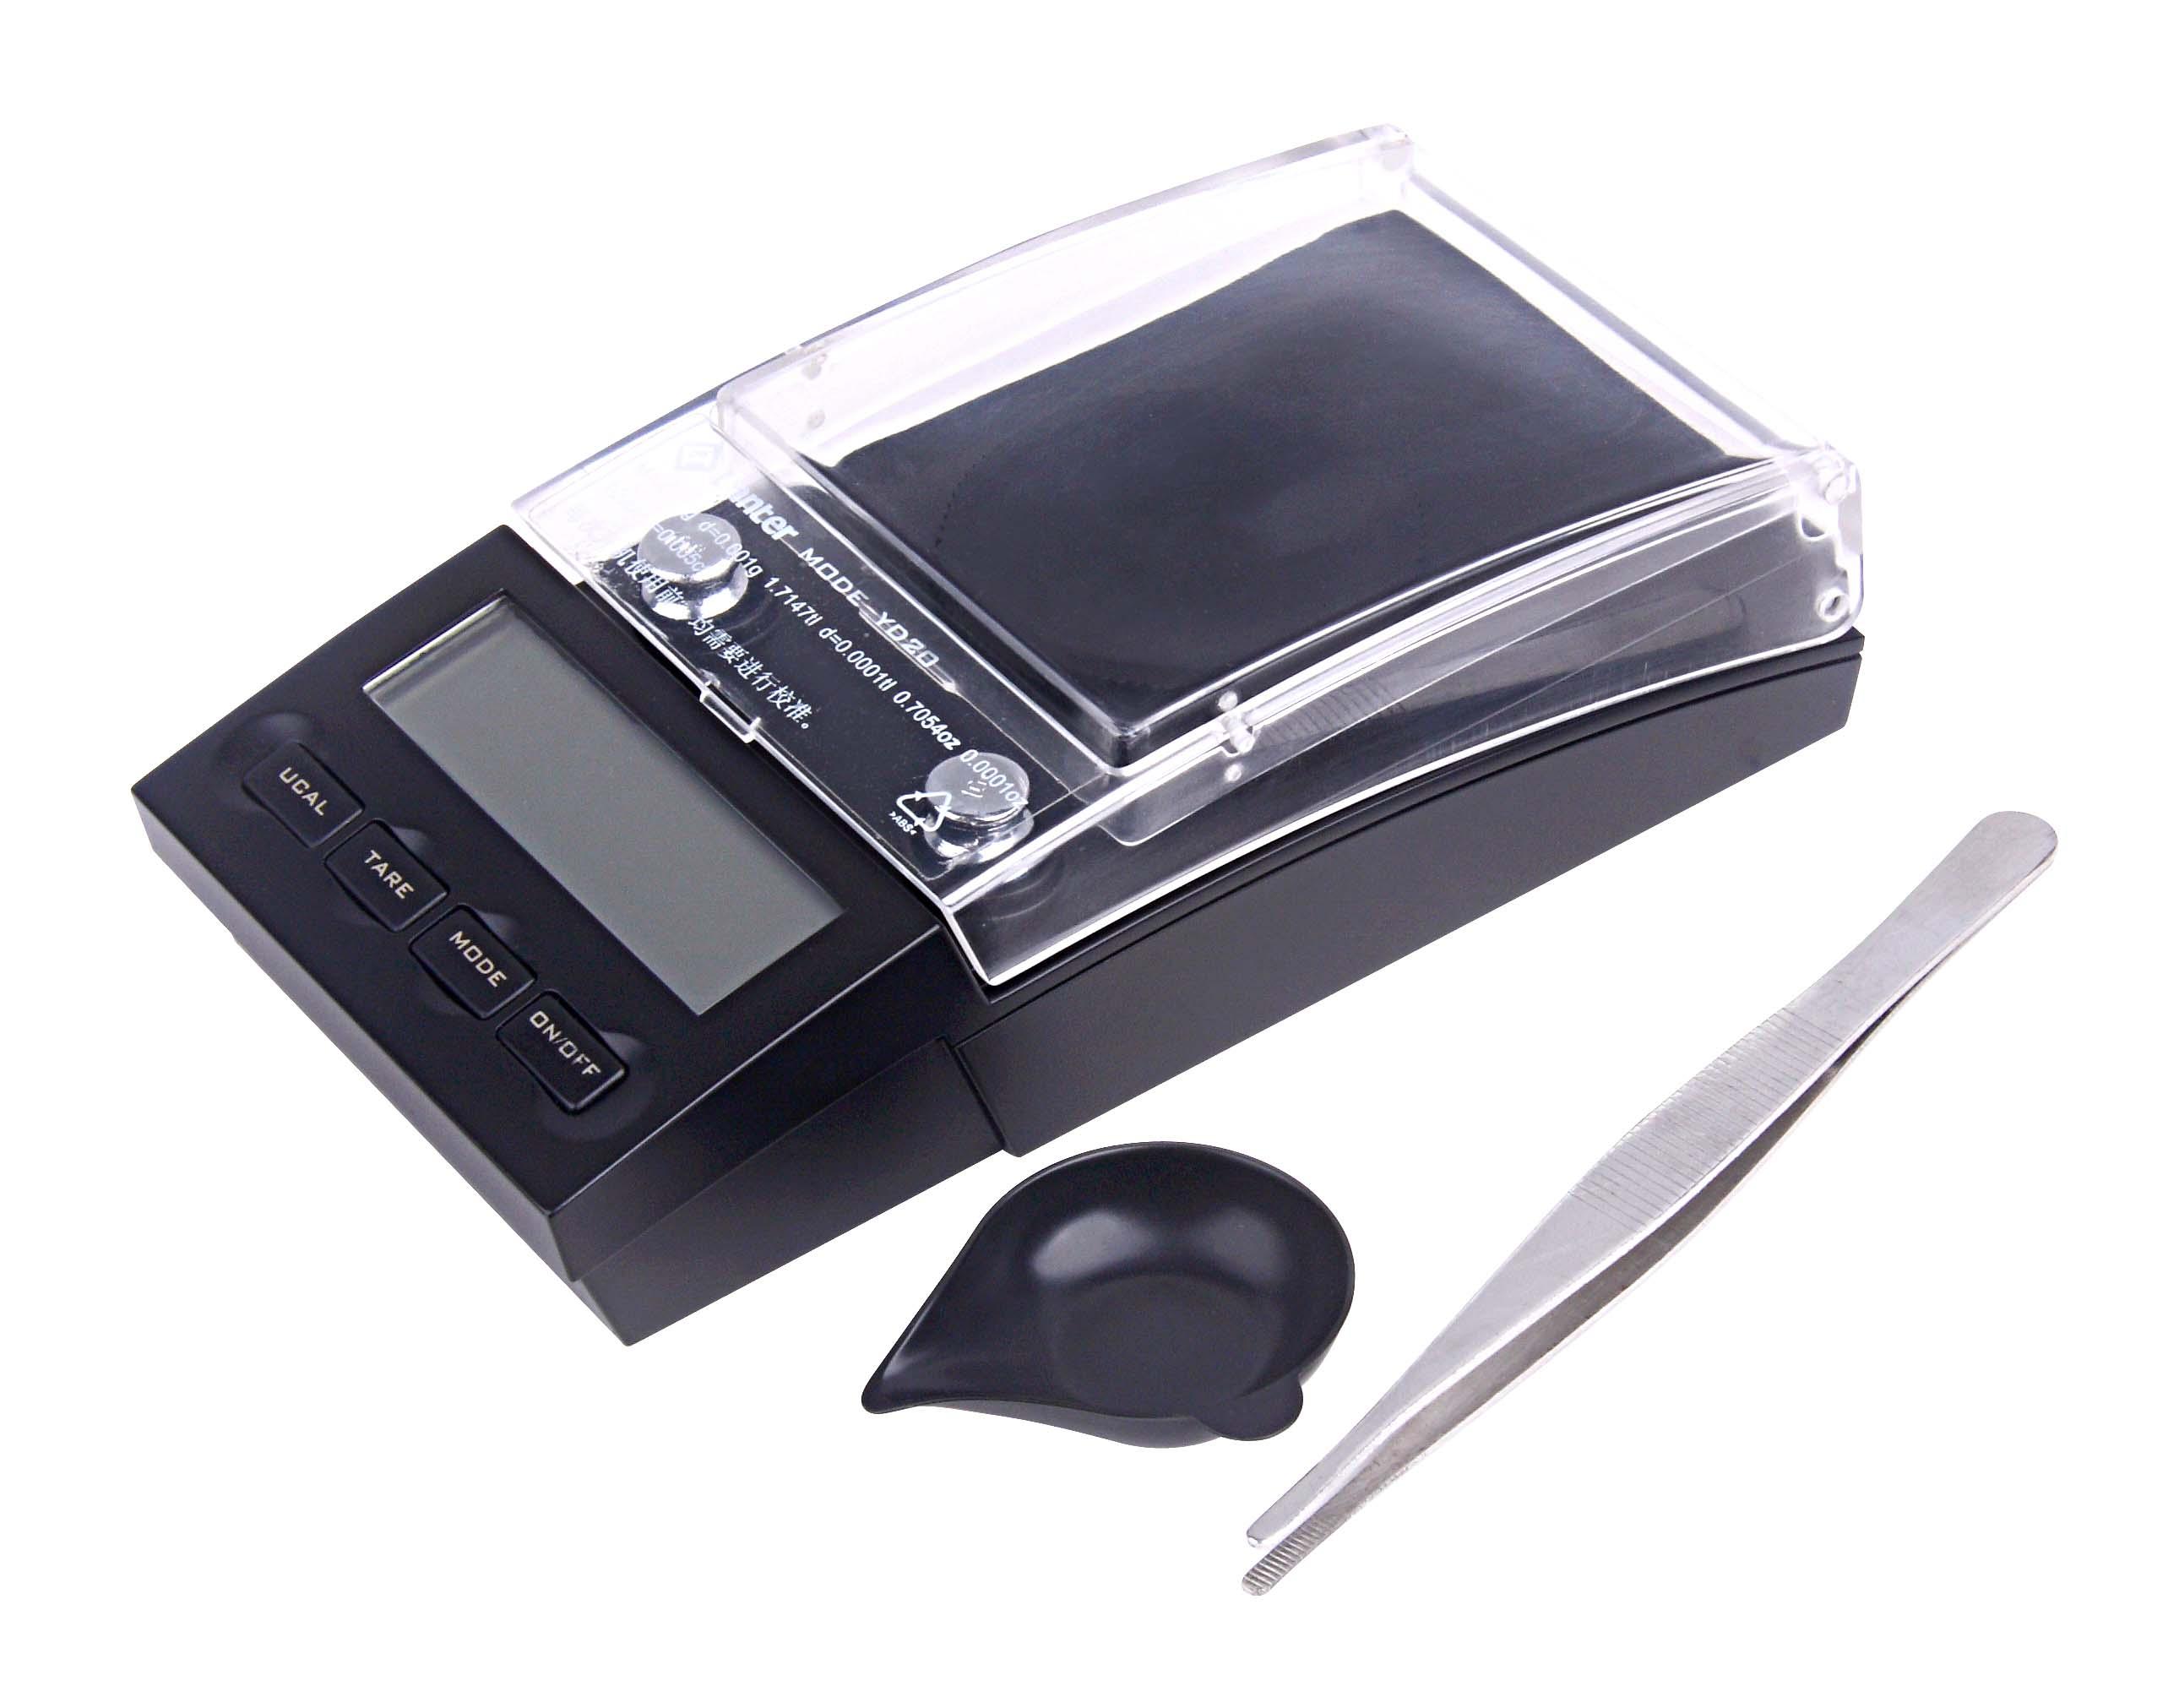 Bilancia Digitale BM-YD Armeria Bersaglio Mobile